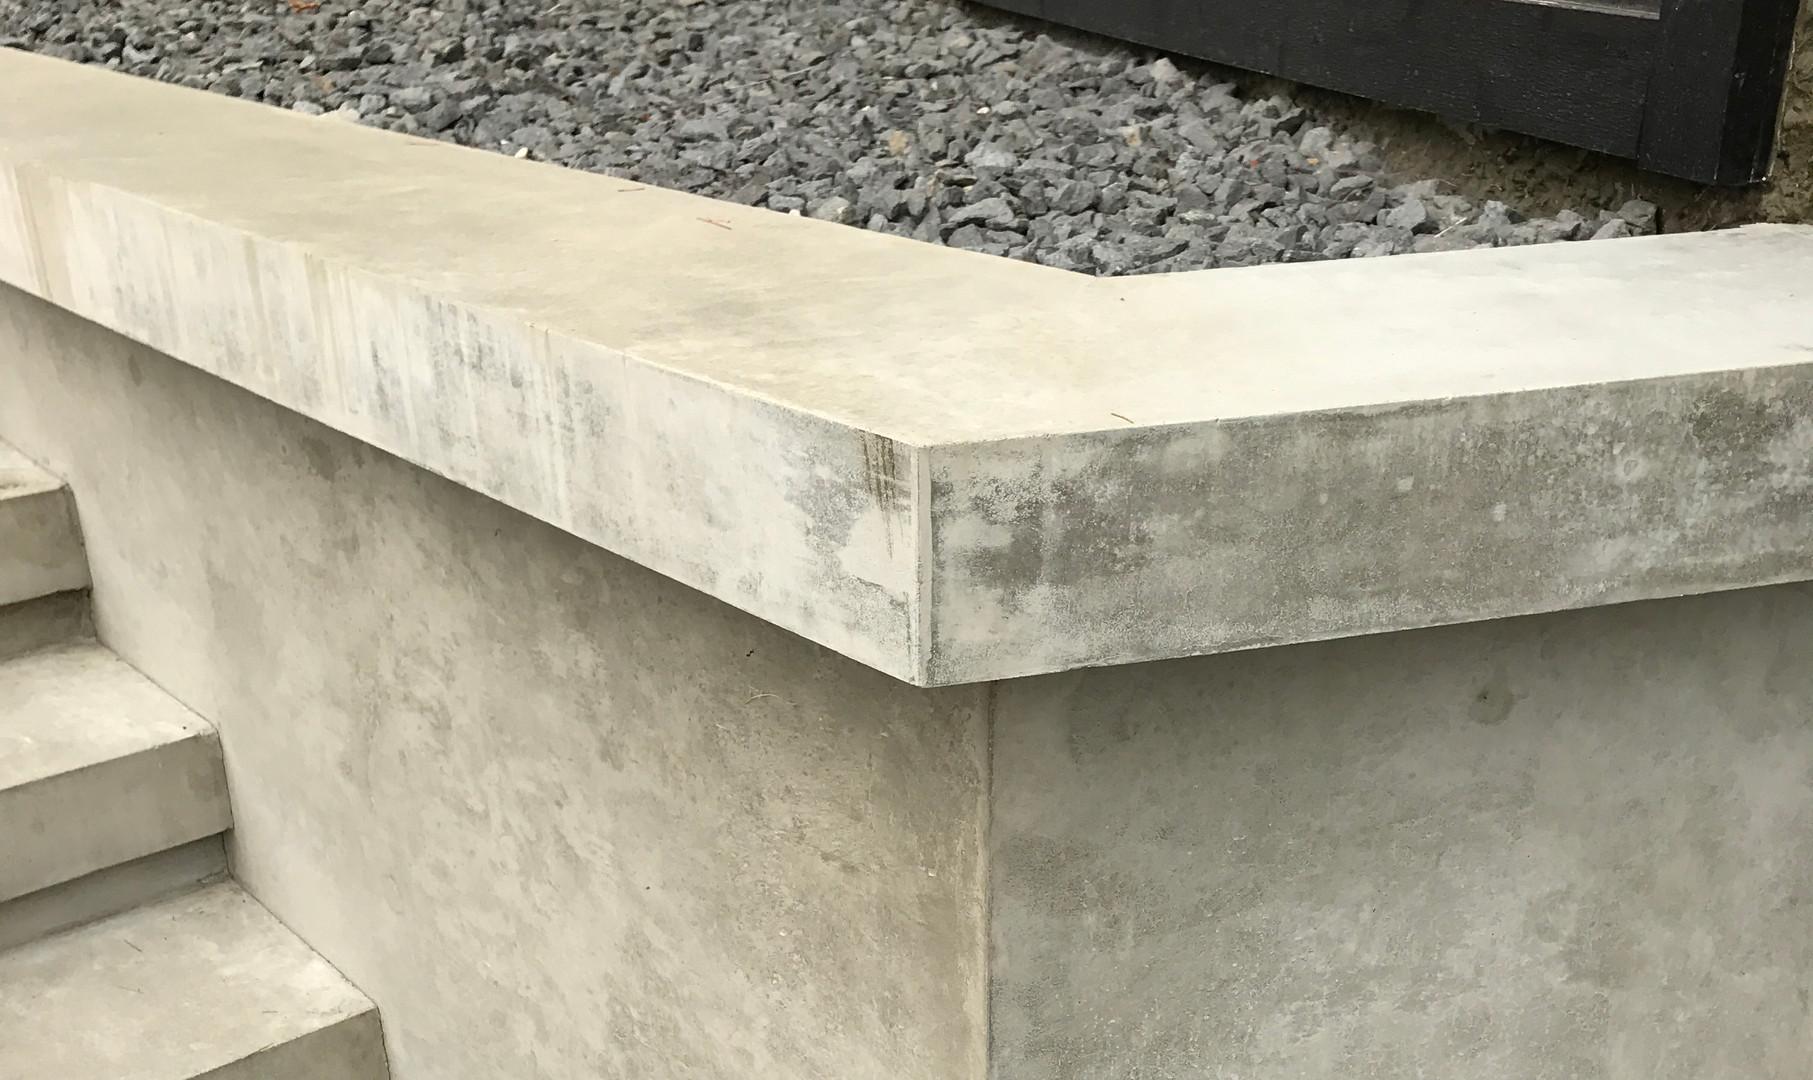 smooth-concrete-retainingwall 02-17999-0